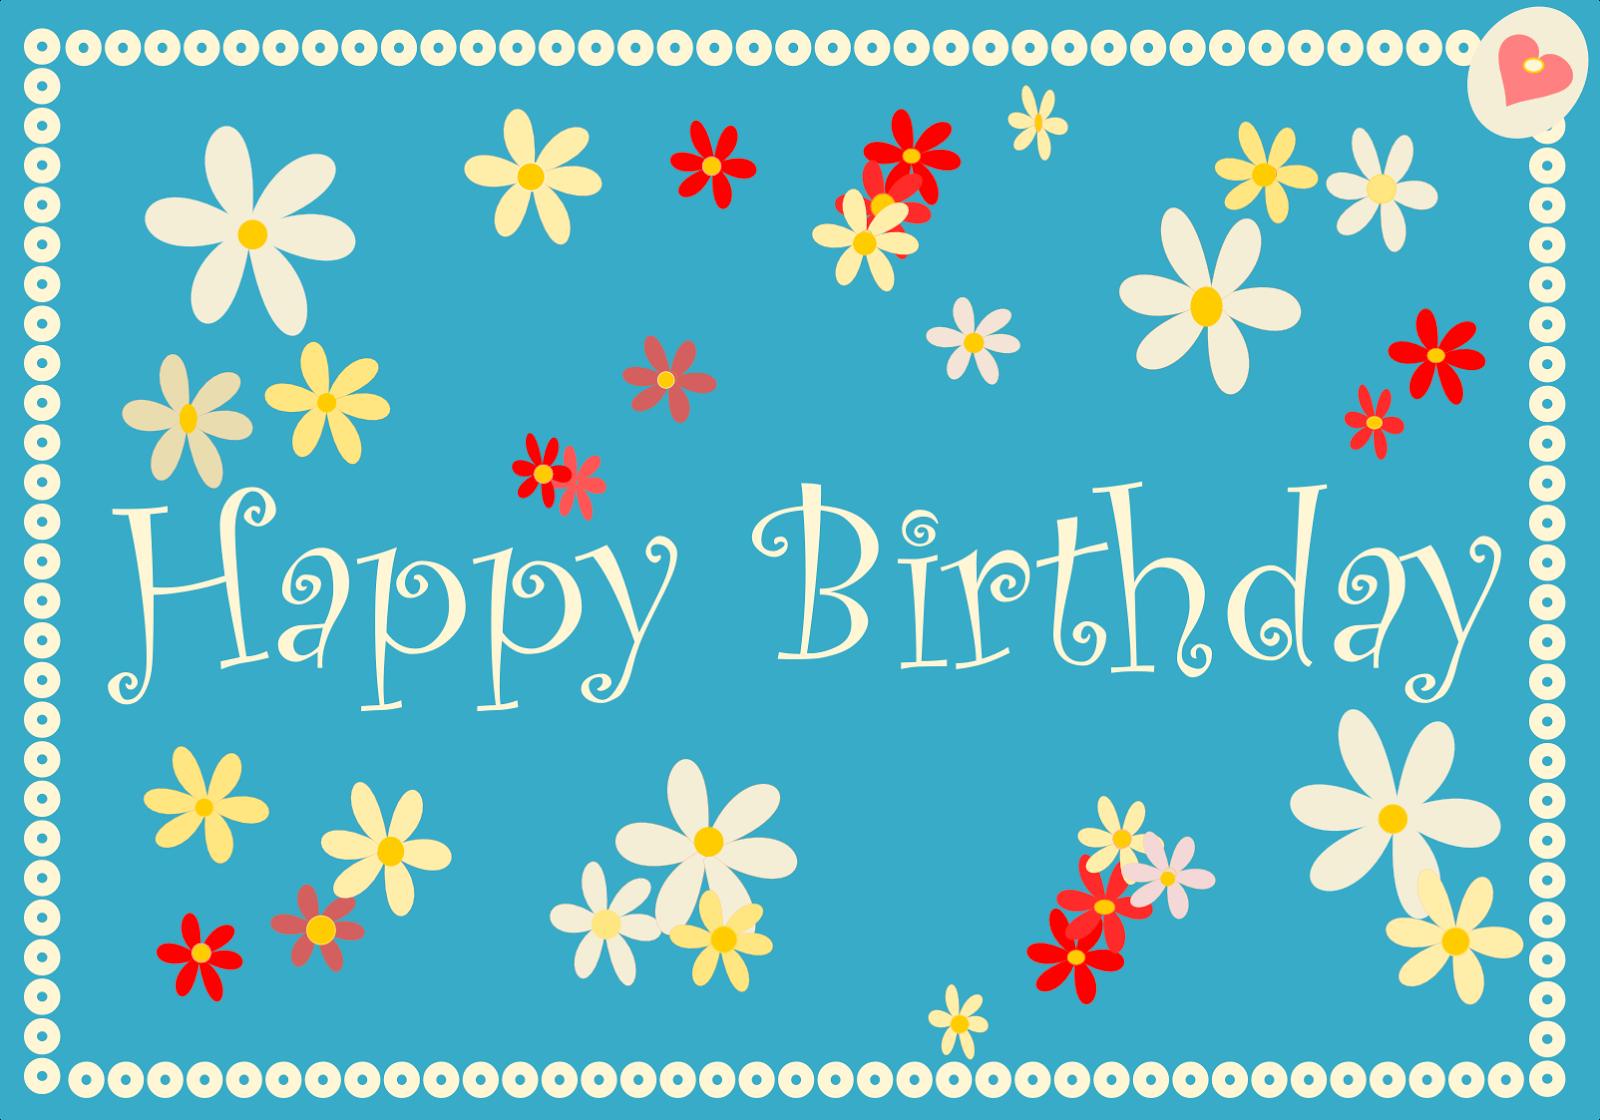 Free Printable Happy Birthday Cards Ausdruckbare Geburtstagskarten Freebies Meinli Happy Birthday Cards Images Happy Birthday Cards Birthday Cards Images